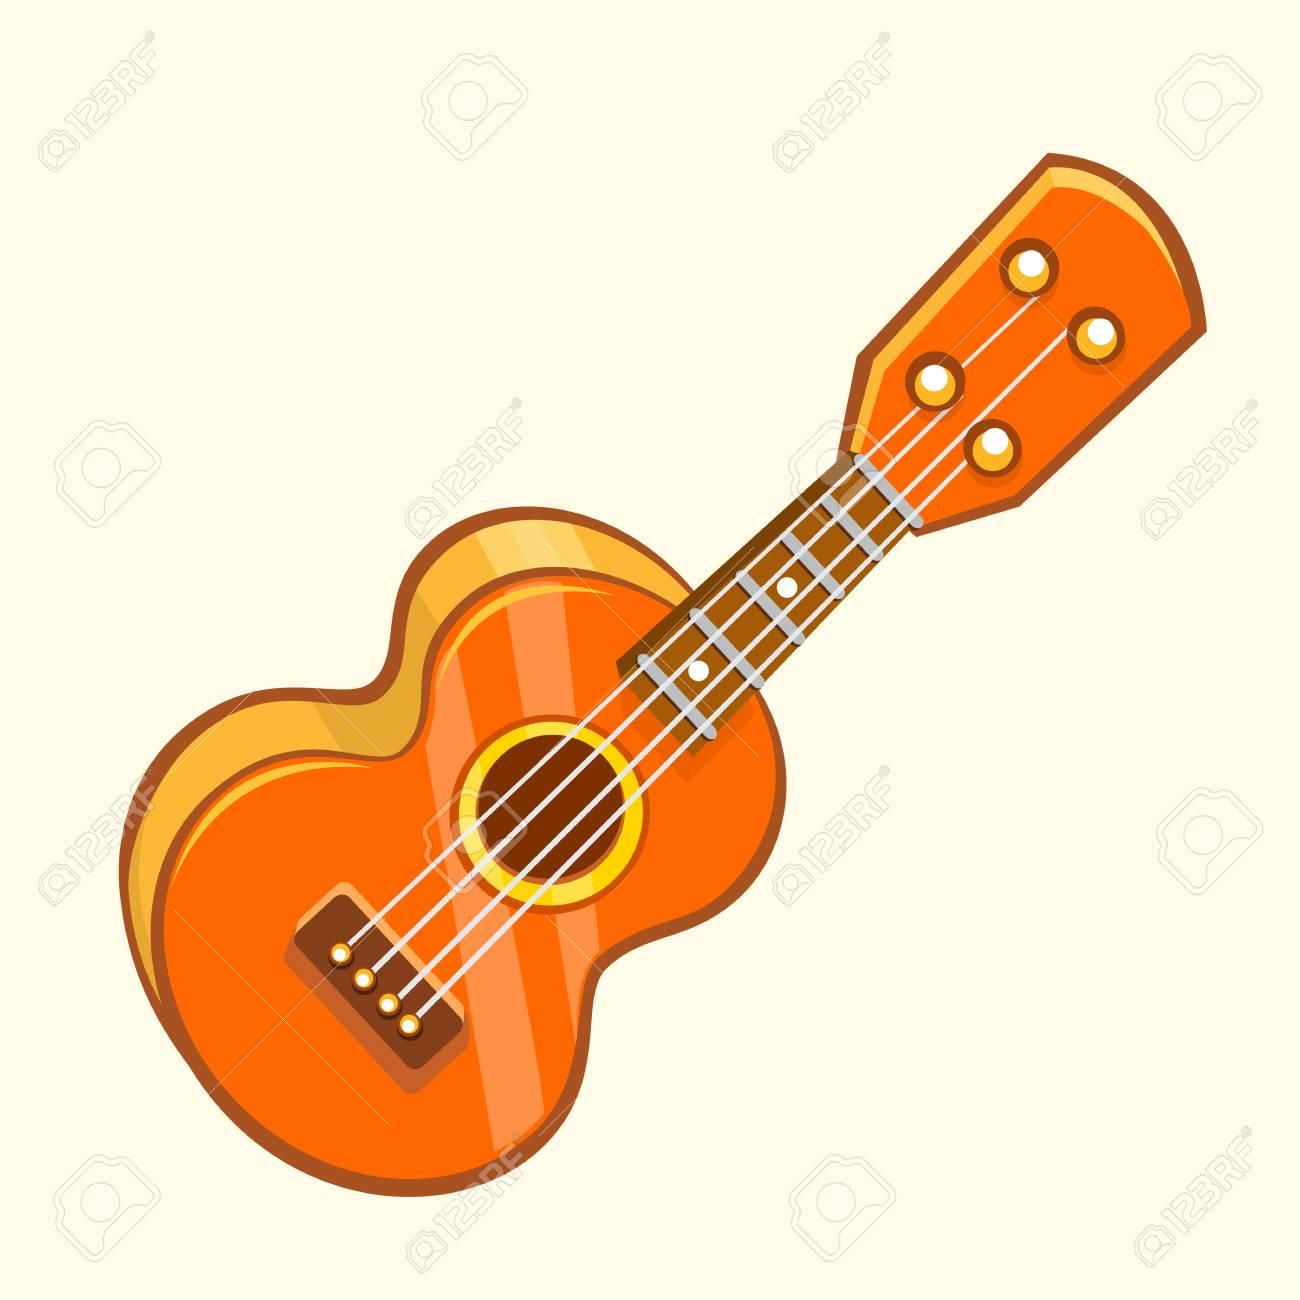 cartoon vector illustration of acoustic guitar or ukulele cartoon rh 123rf com  acoustic guitar outline clipart